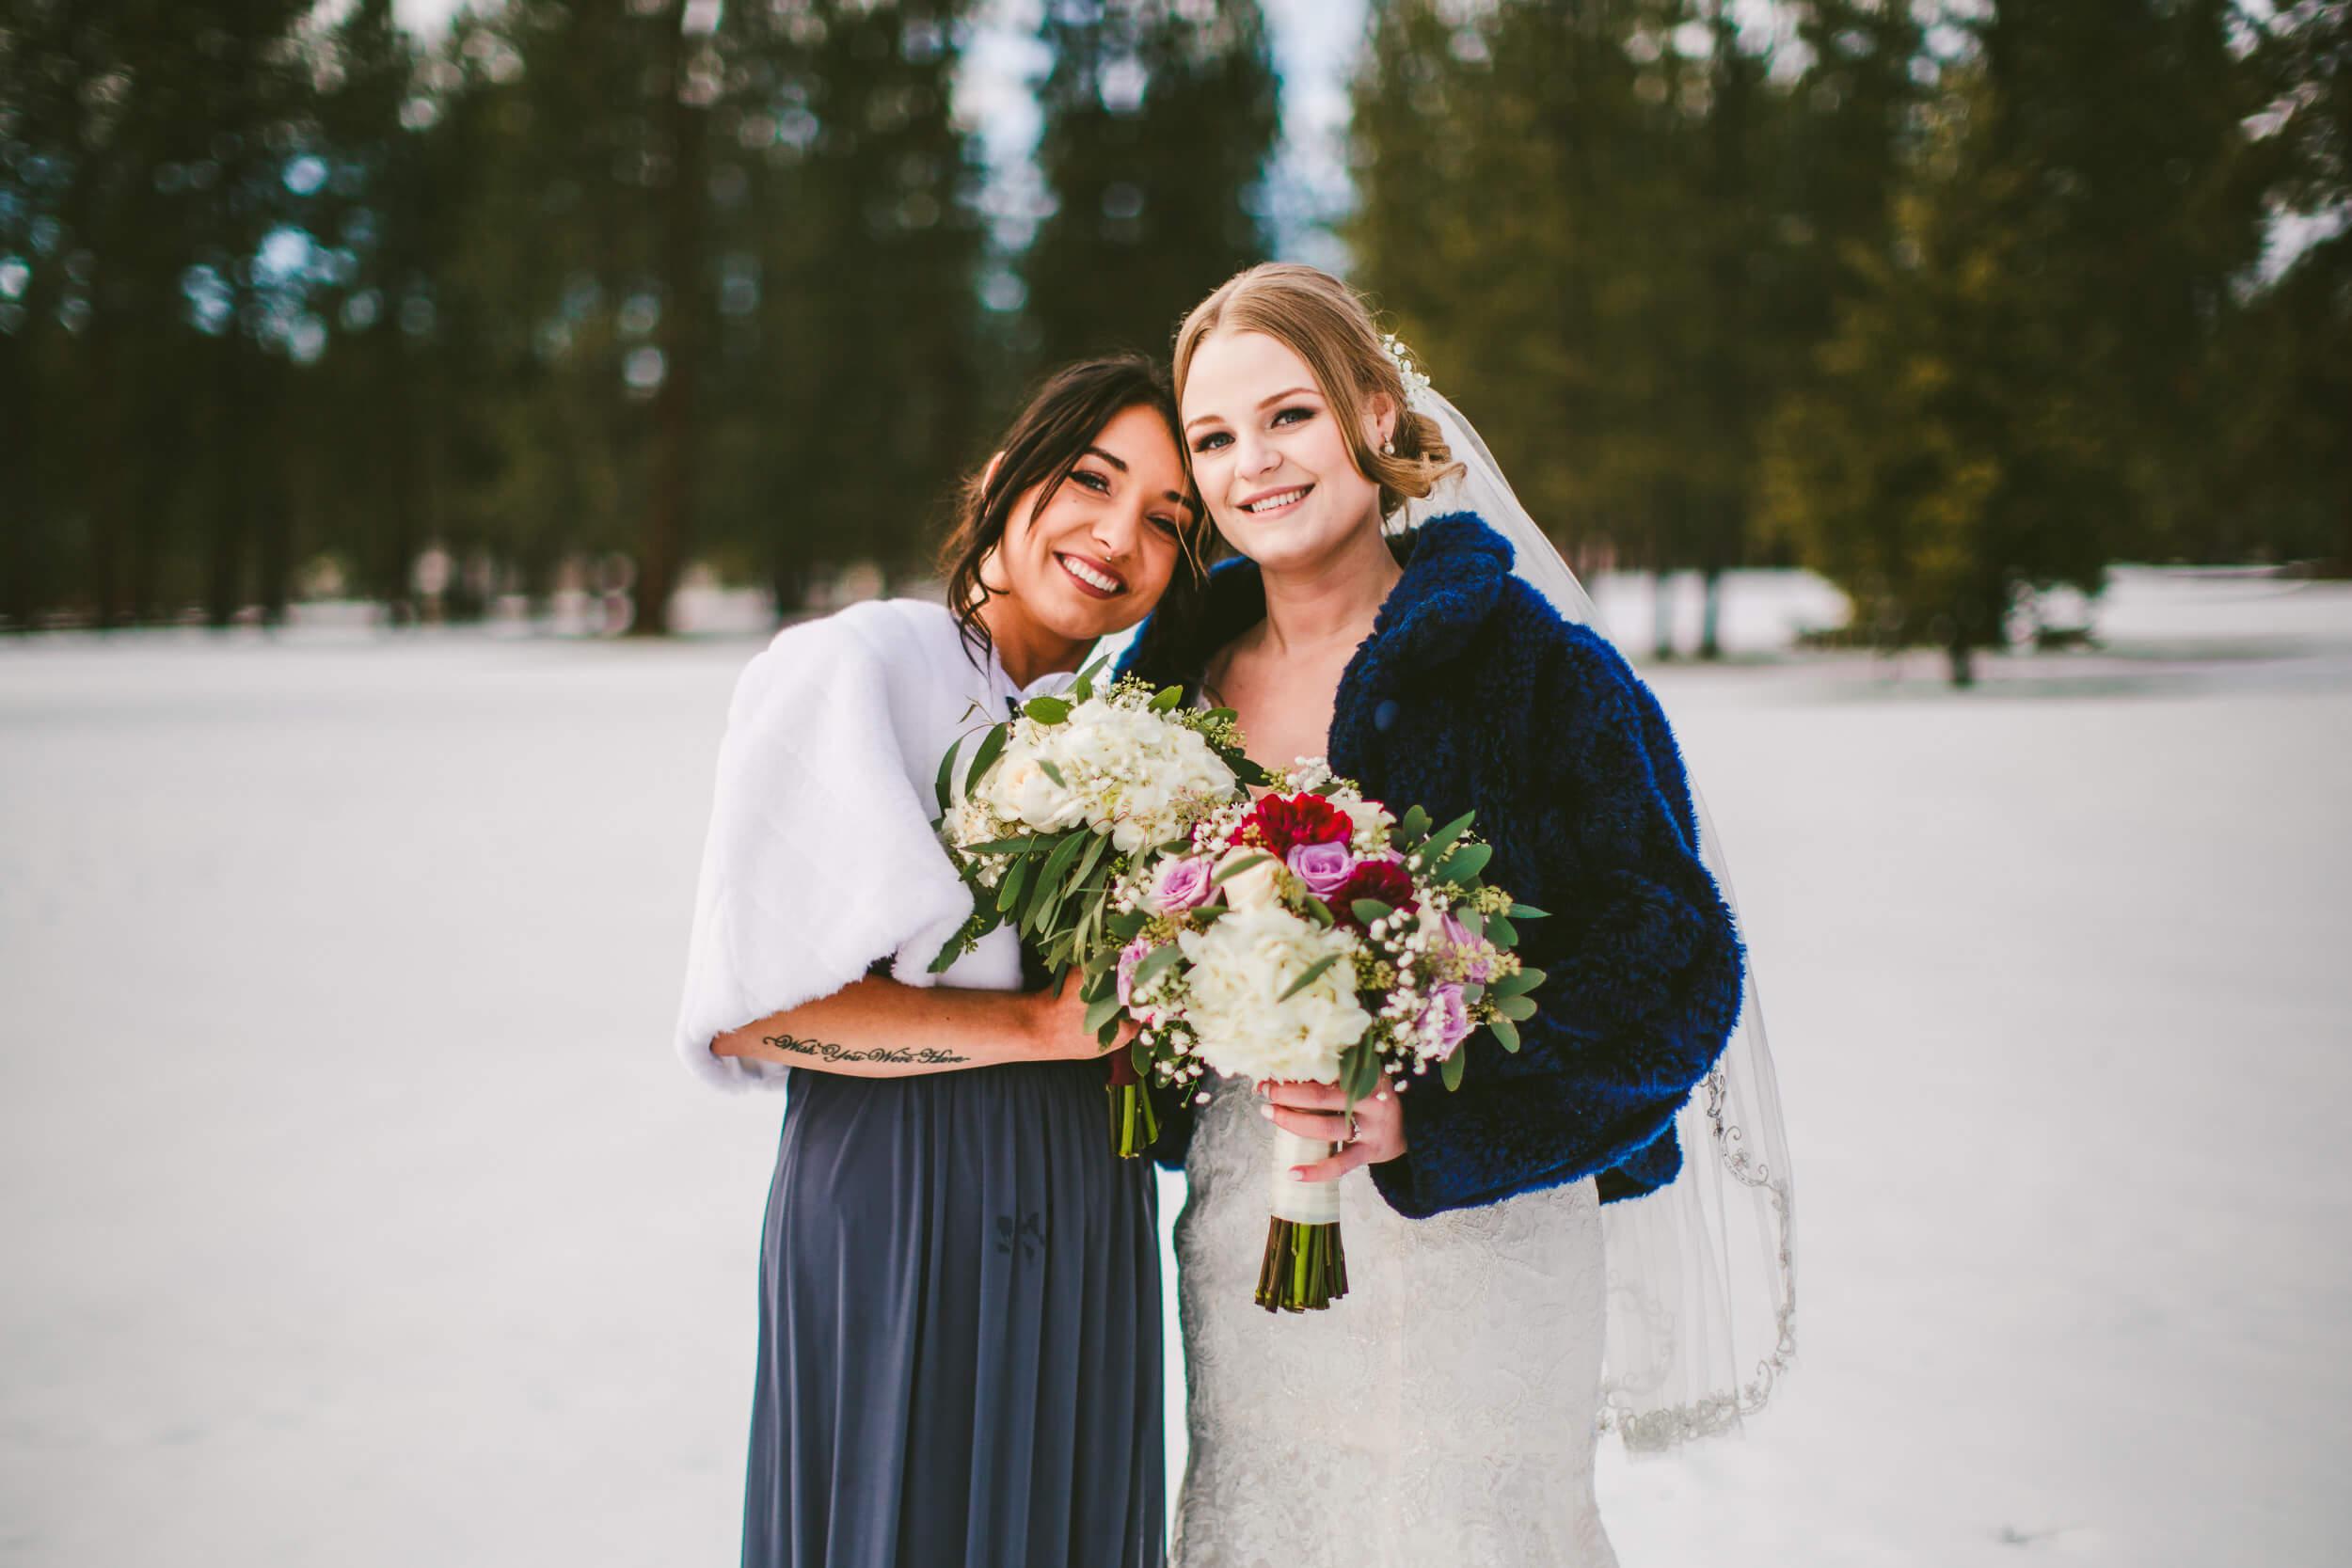 mukogawa winter wedding in spokane (104).jpg